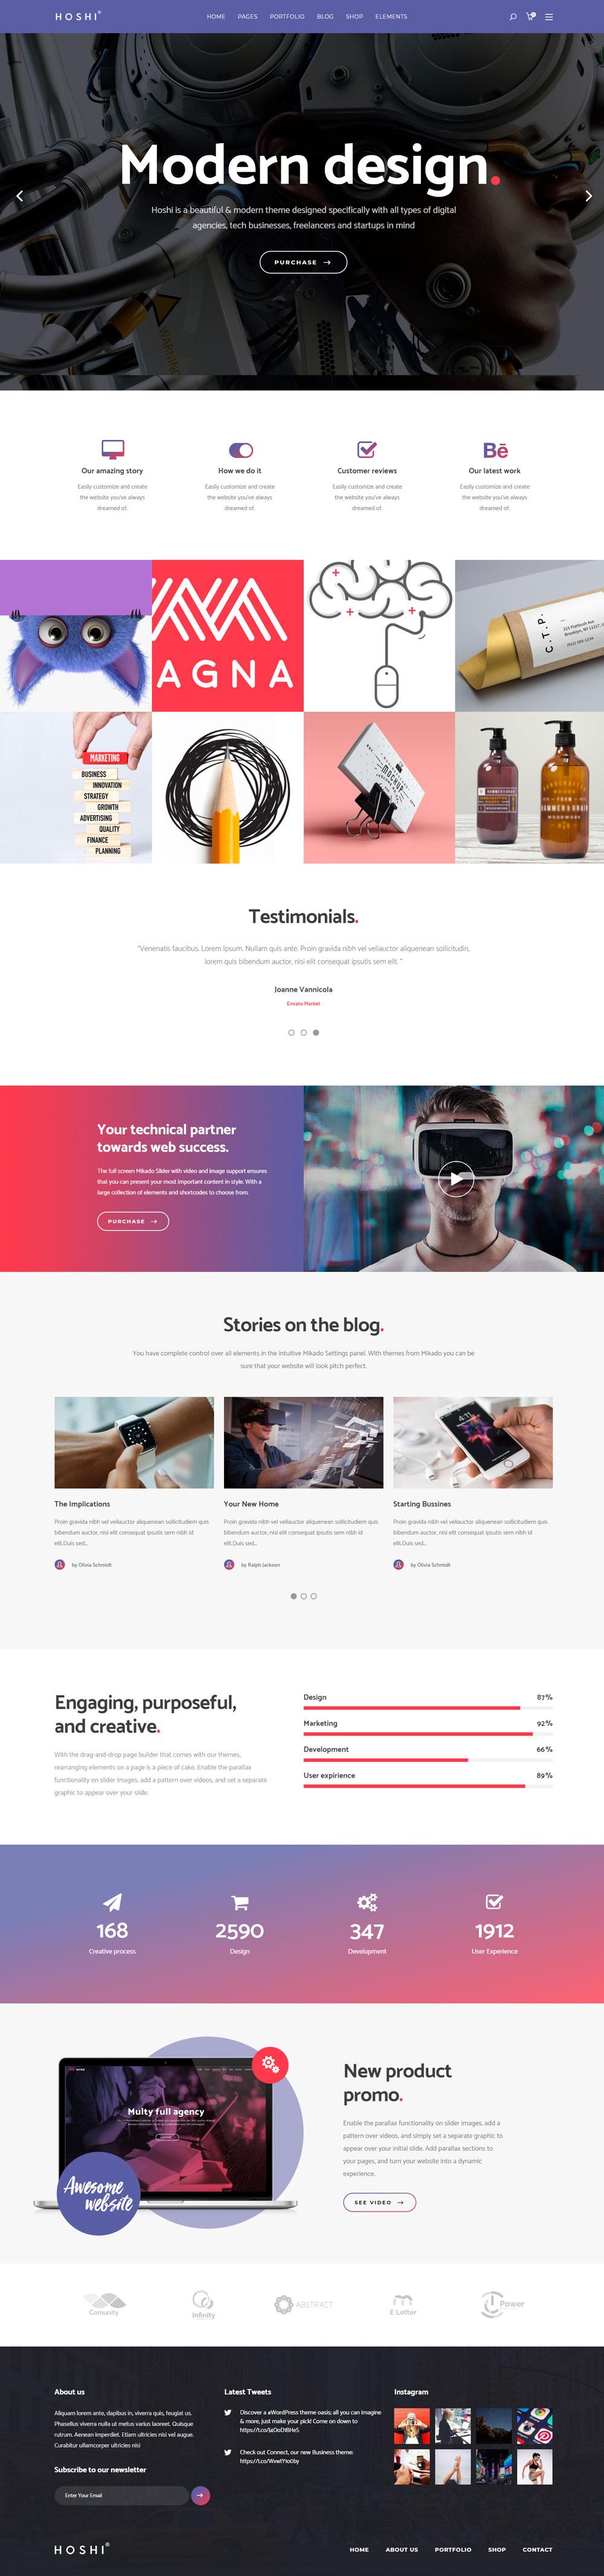 Hoshi - A Modern Theme for Freelancers